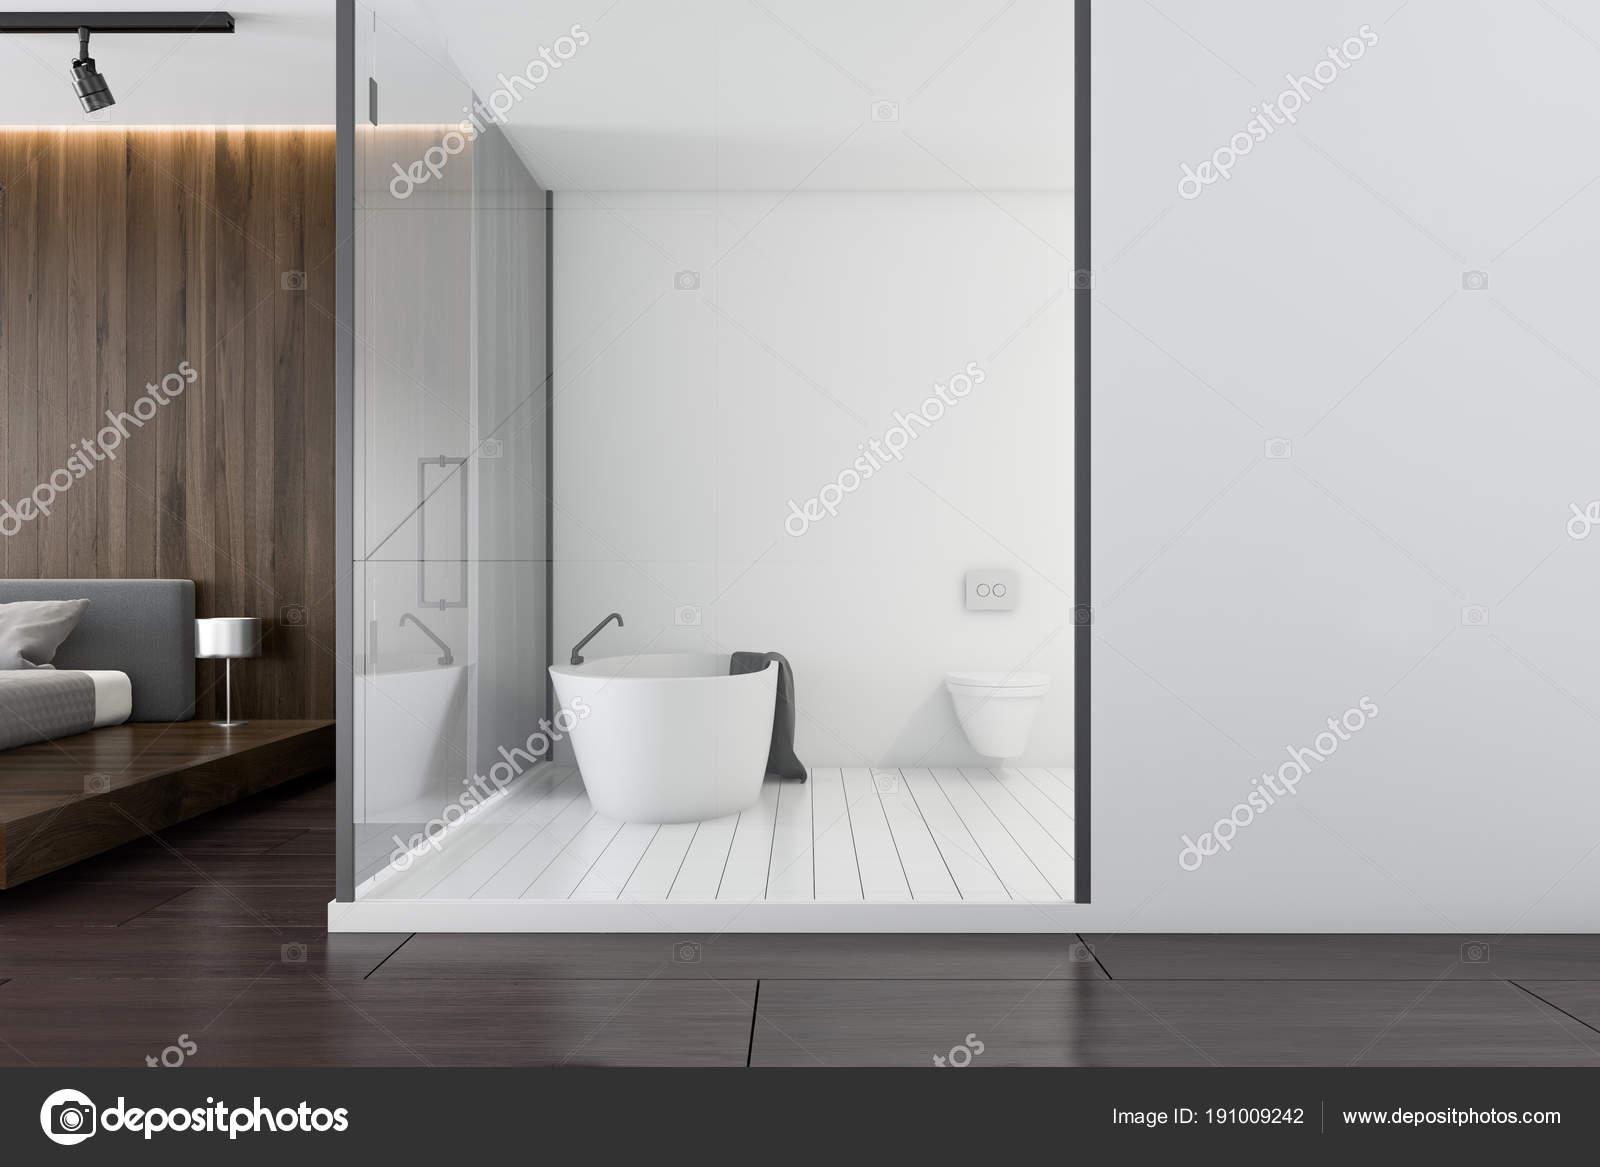 Luxe Donkere Badkamer : Witte en donkere houten luxe badkamer zijaanzicht u2014 stockfoto